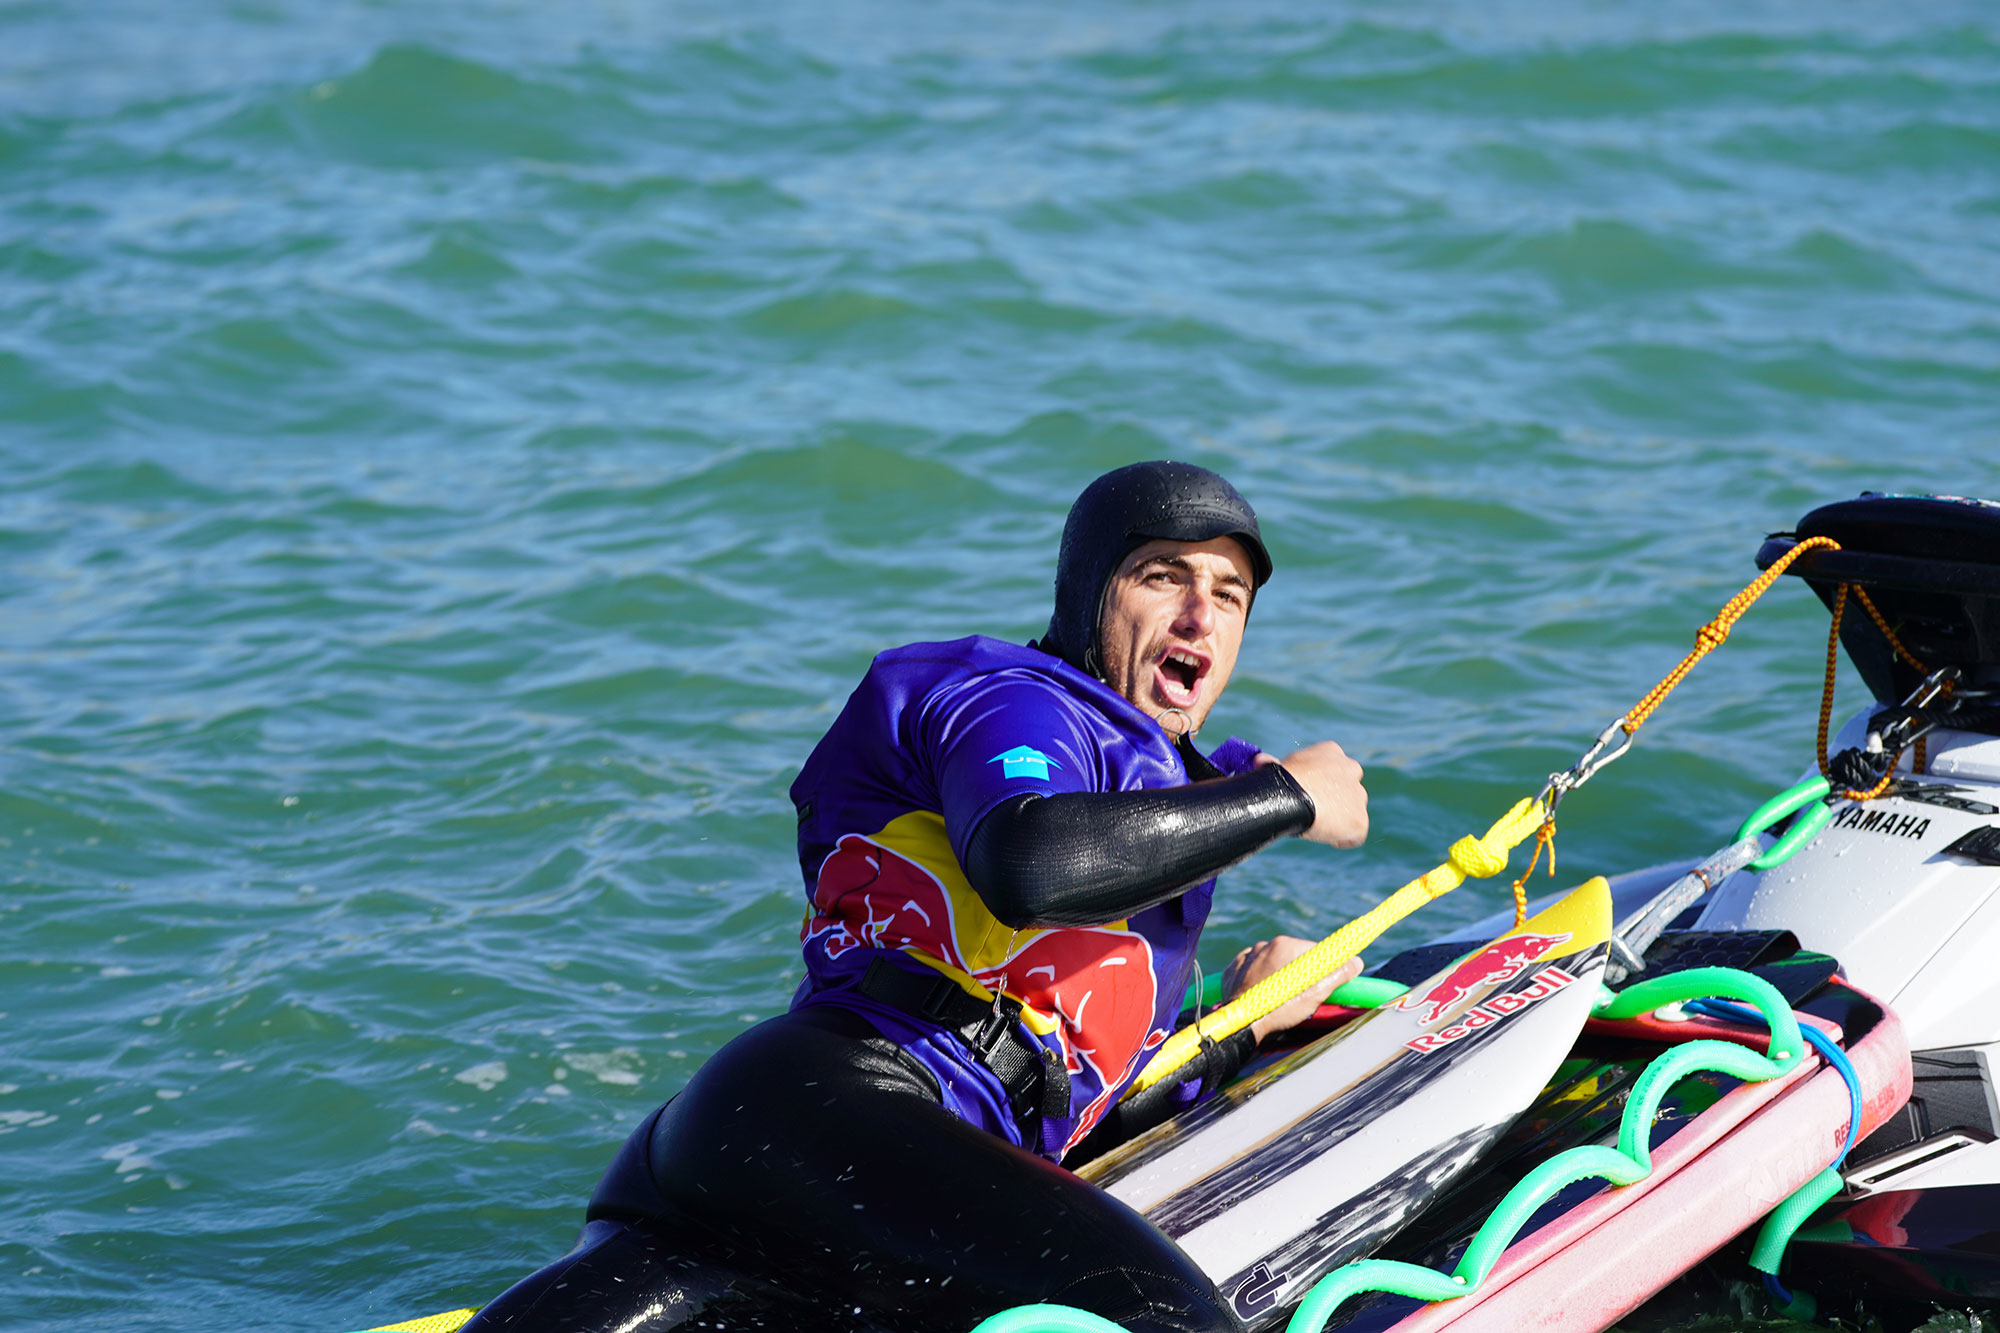 Natxo González celebra su nueva hazaña. | Foto: Jon Aspuru / Red Bull Content Pool